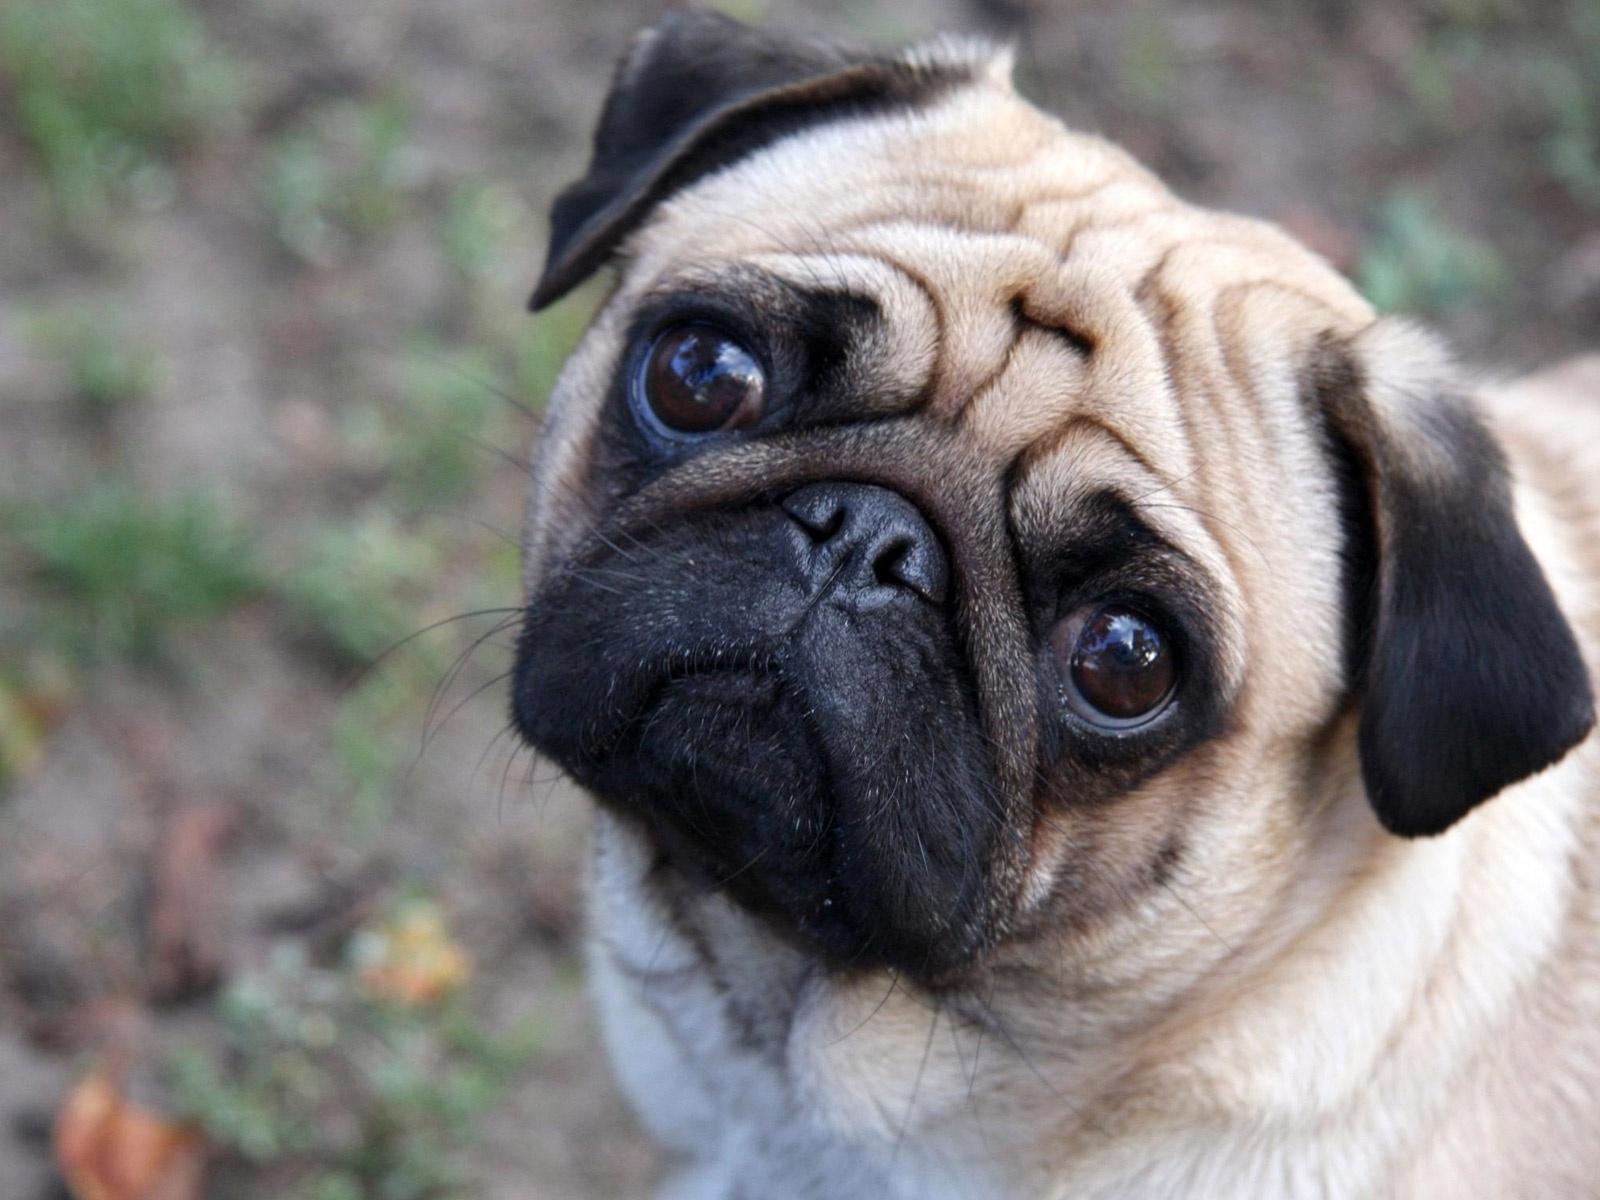 Download Pug Dog Hd Wallpaper Gallery: Cute Dogs: Pug Dog